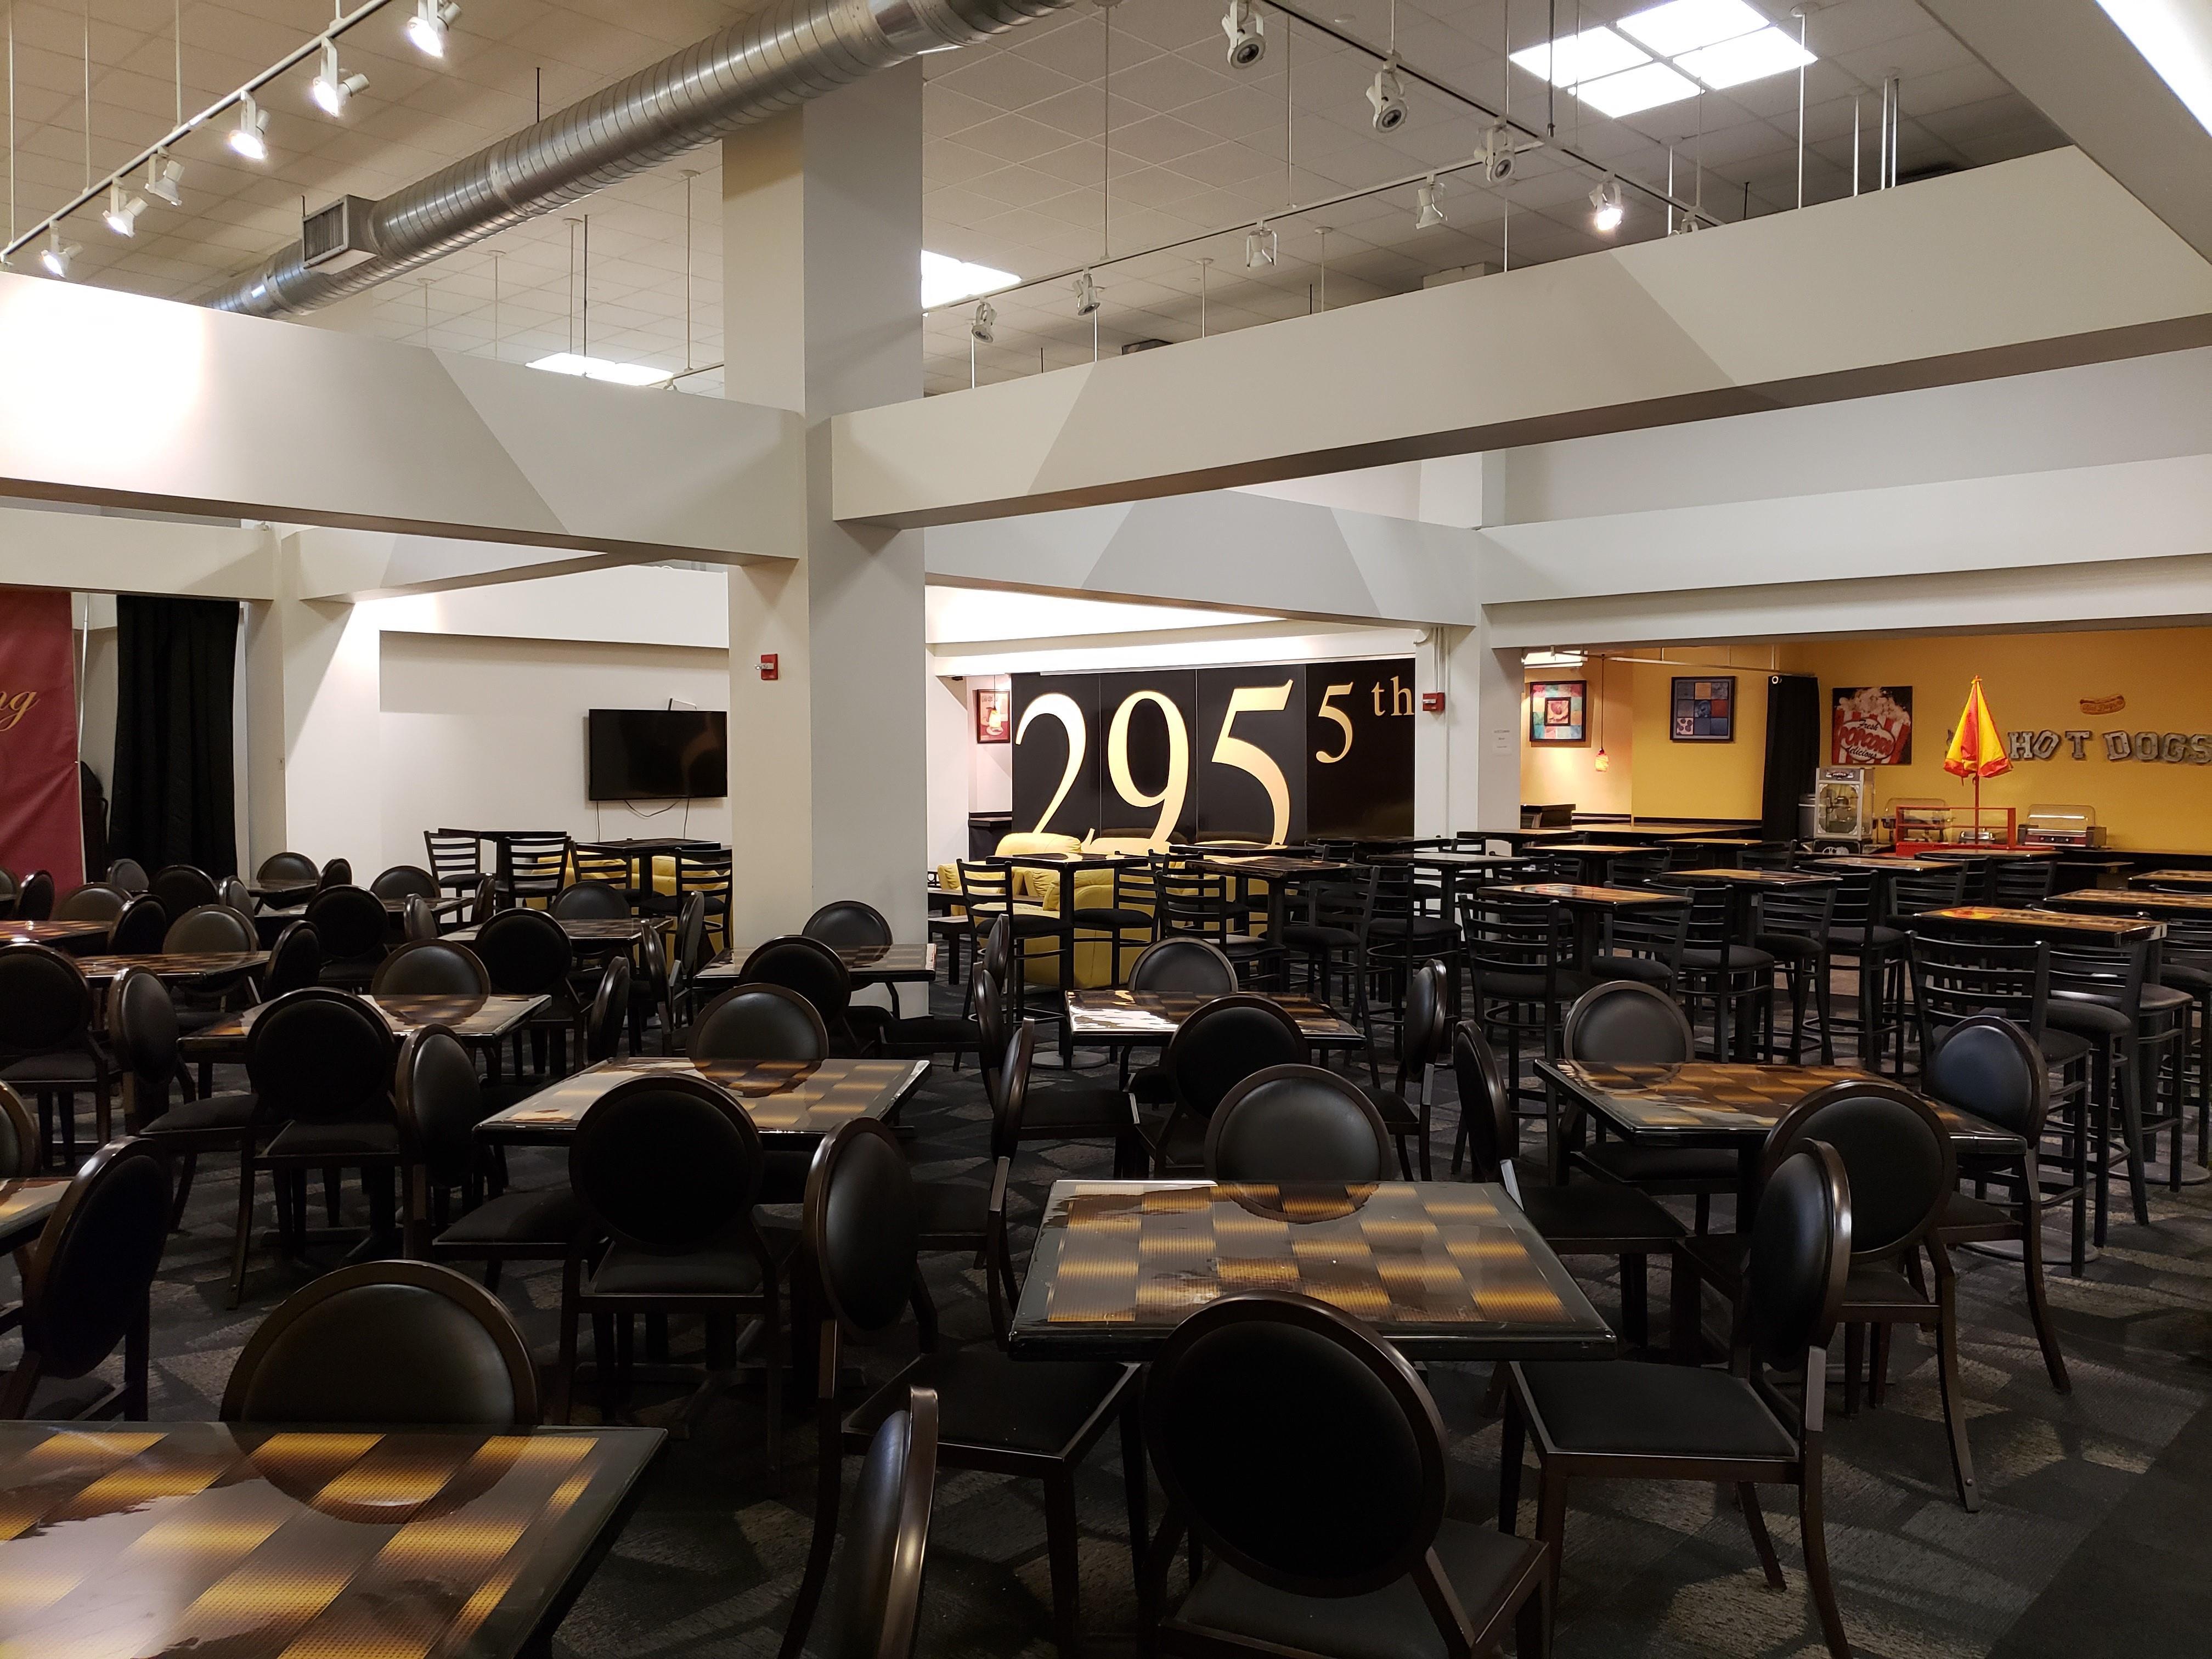 The Textile Building - Lounge